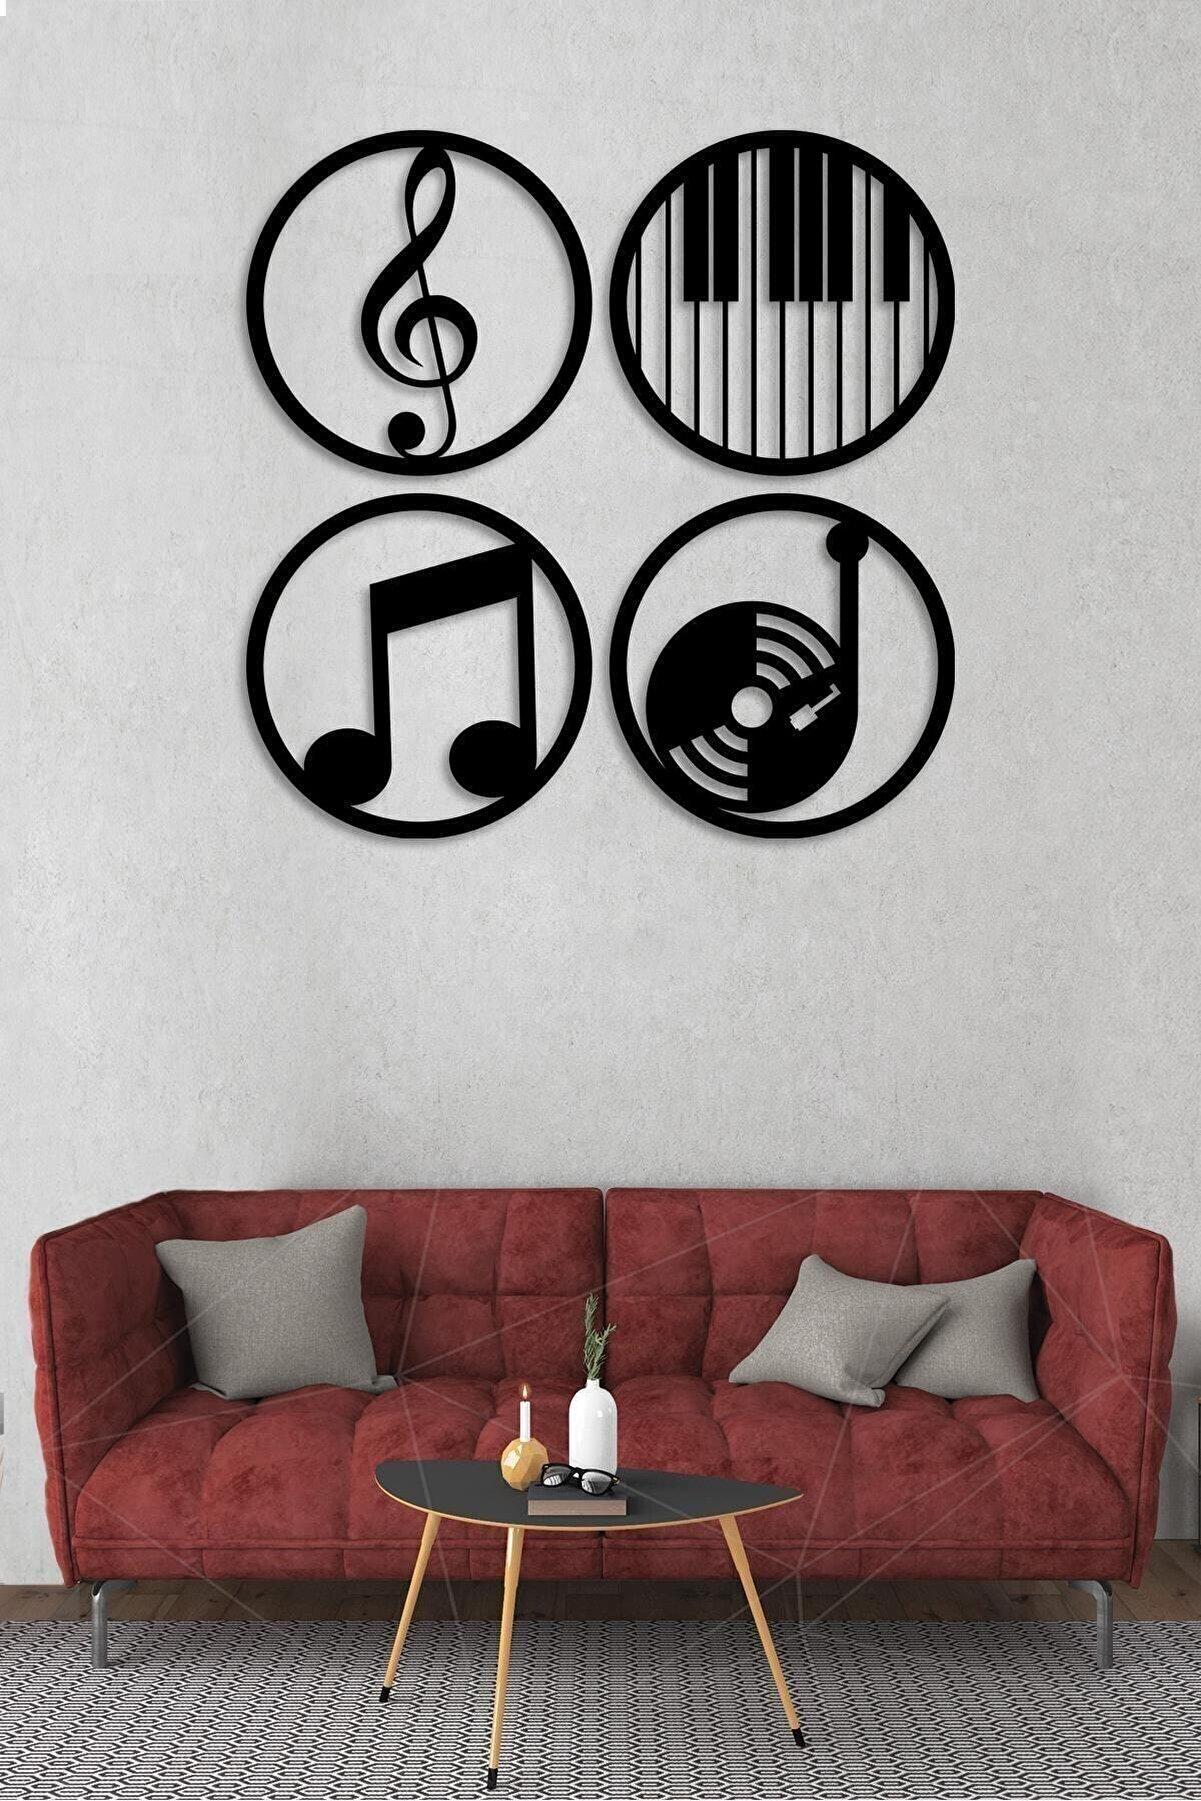 Alfanua Müzik Nota Ahşap Mdf Dekoratif Tablo - Müzik Temalı Duvar Dekoru